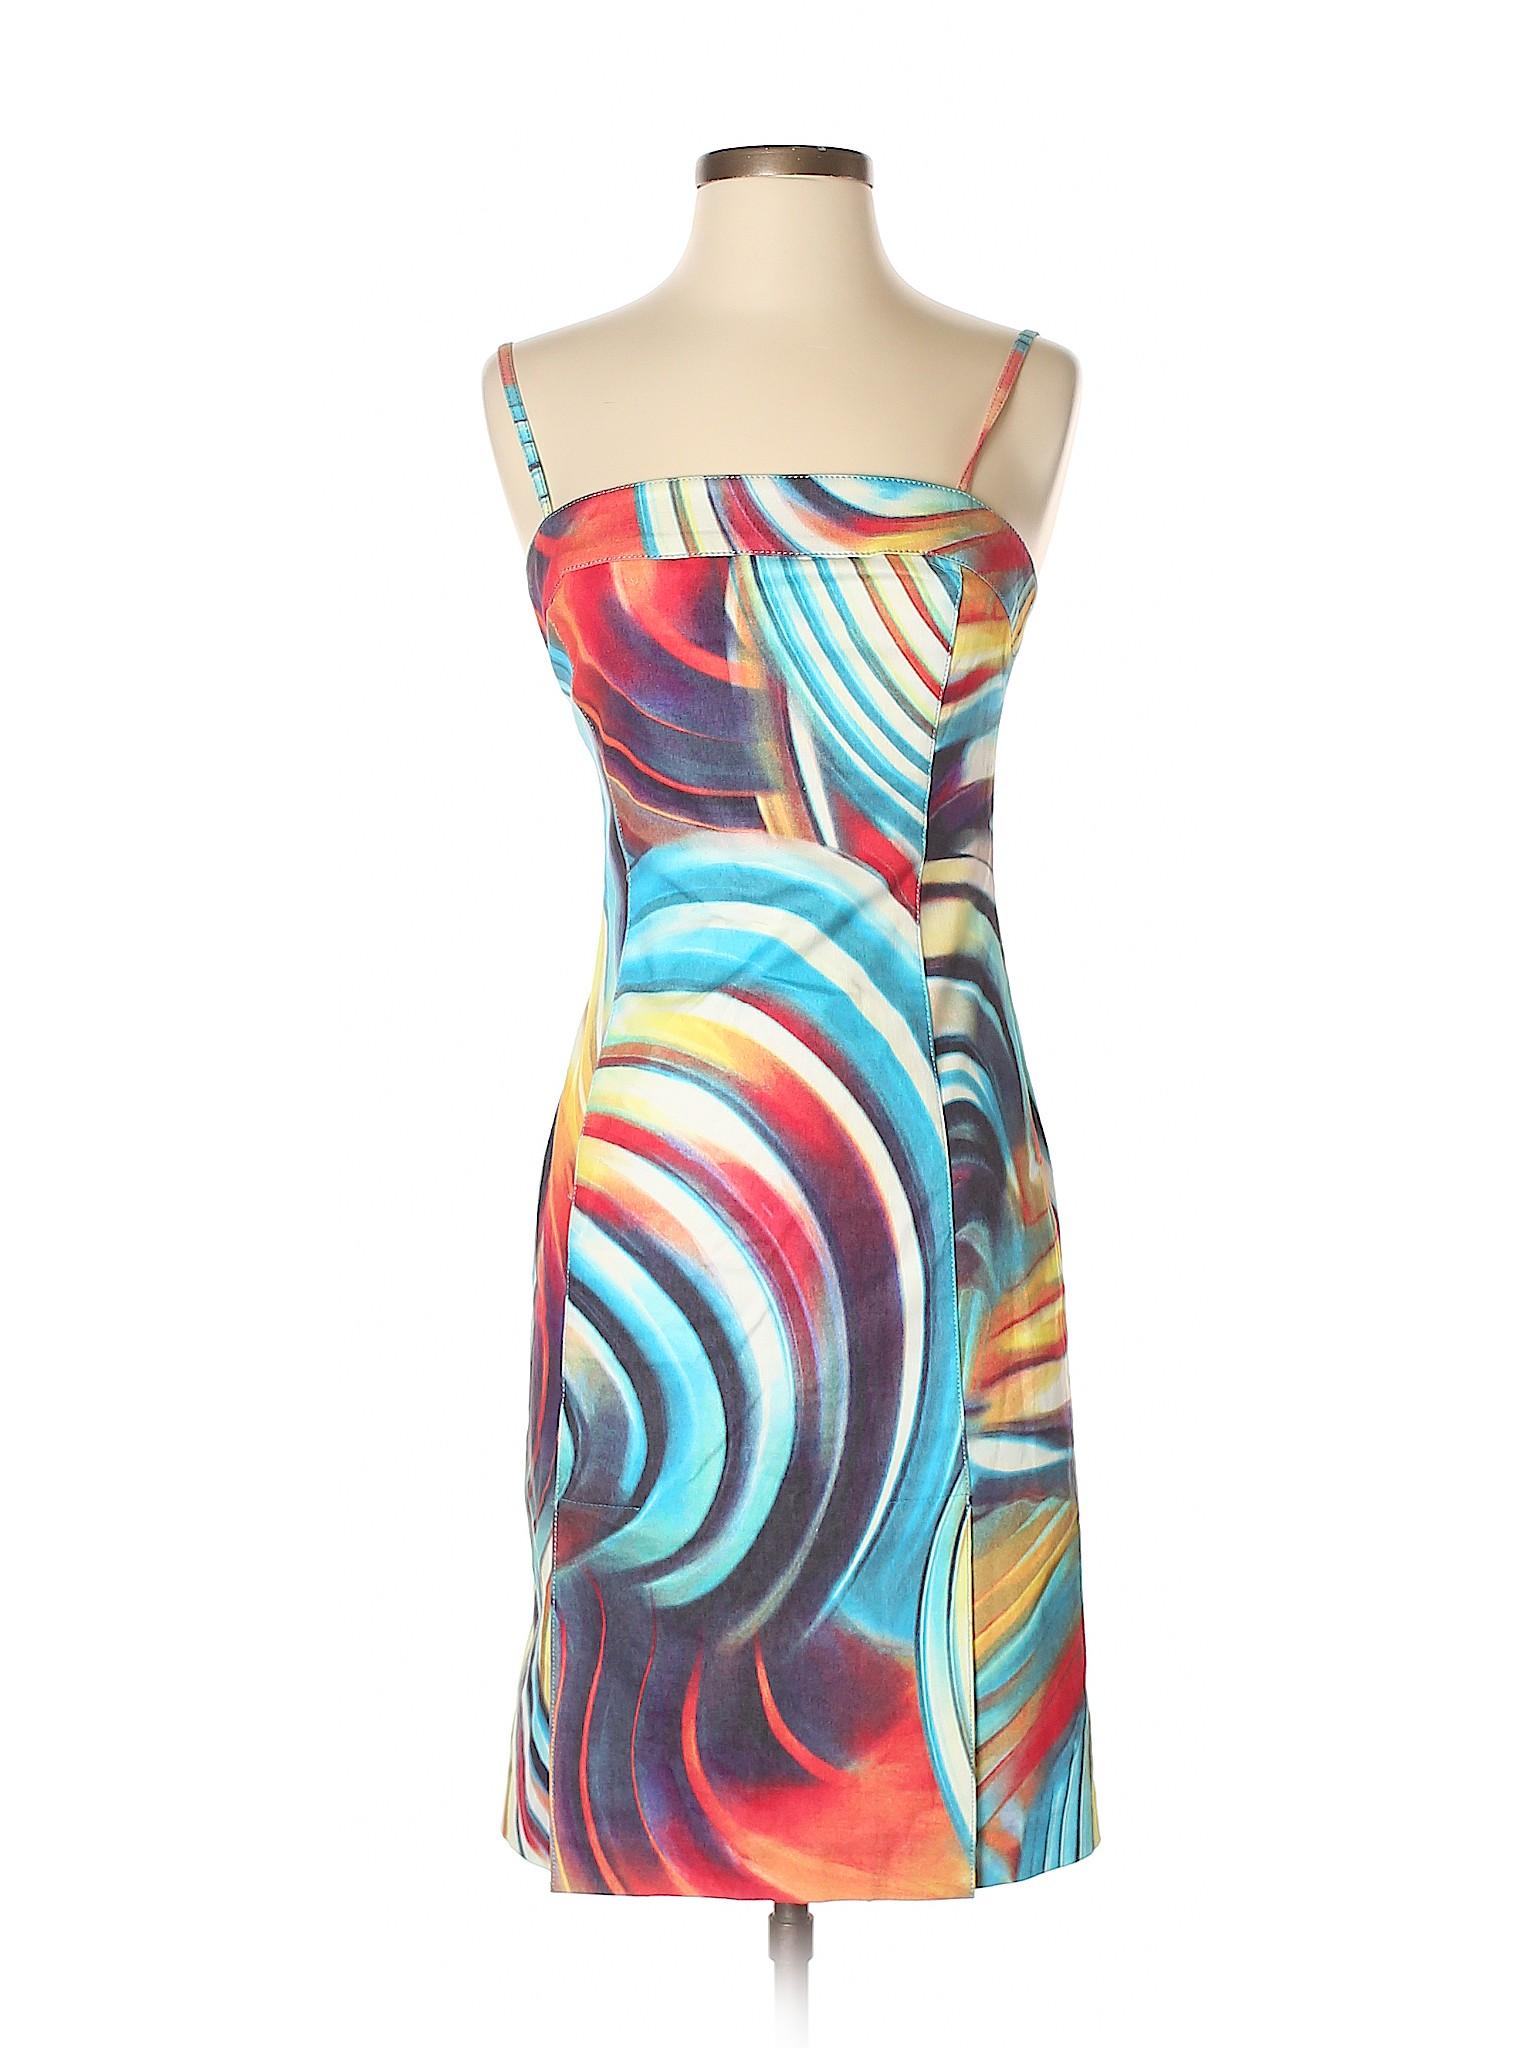 Boutique Makali Winter Dress Alberto Casual 8a17w8qr